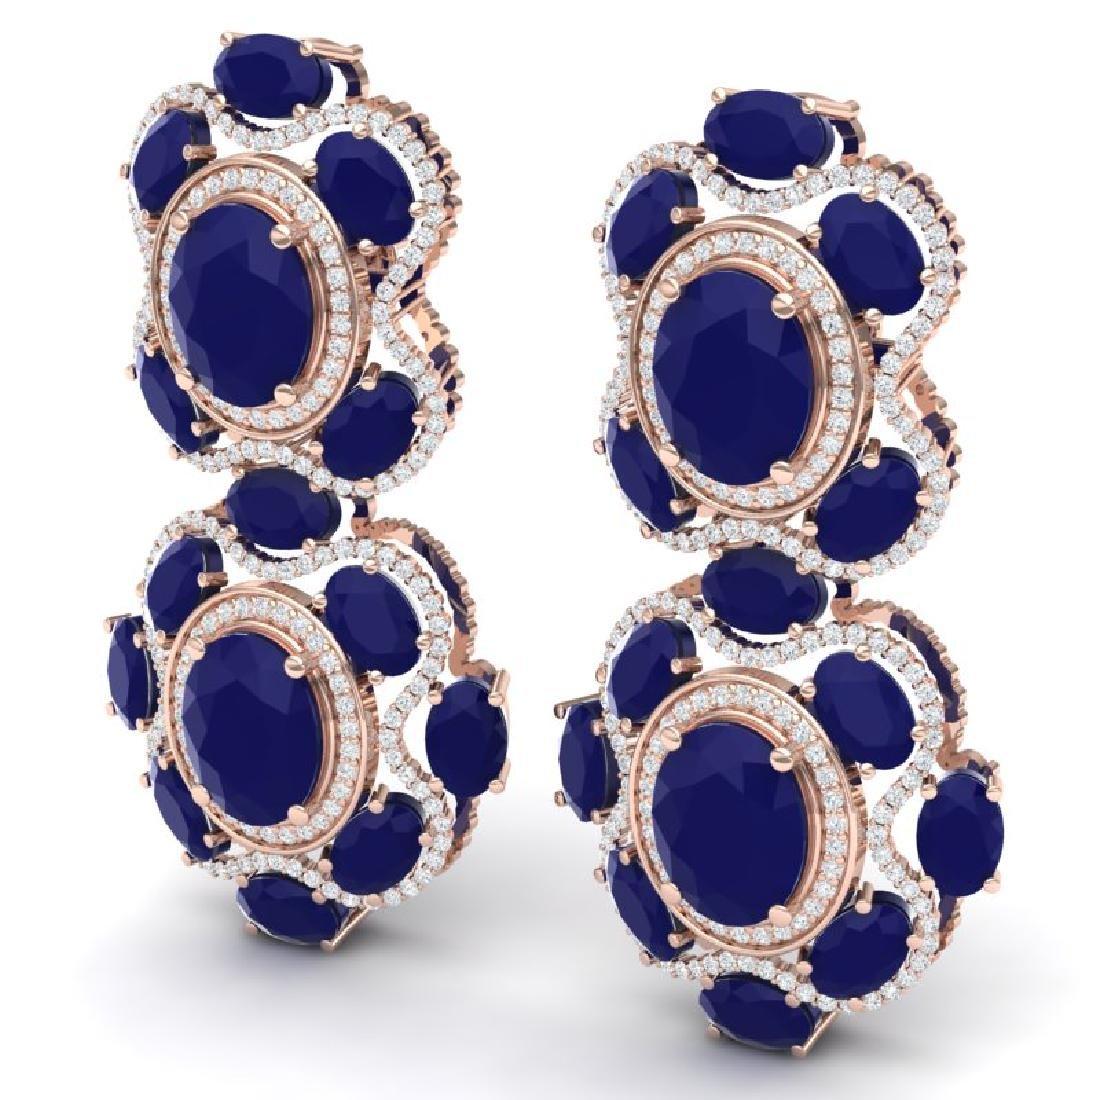 33.5 CTW Royalty Sapphire & VS Diamond Earrings 18K - 2